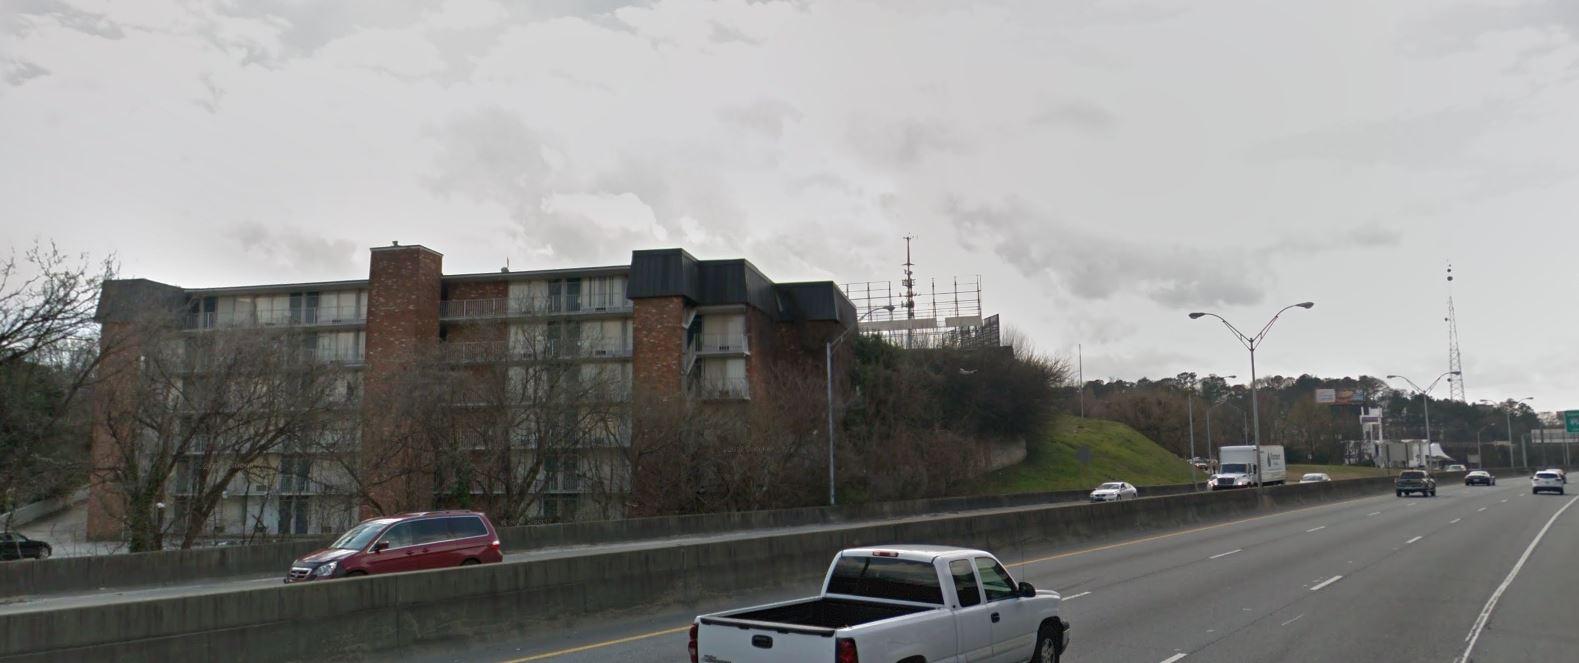 A six-story mid-century motel.